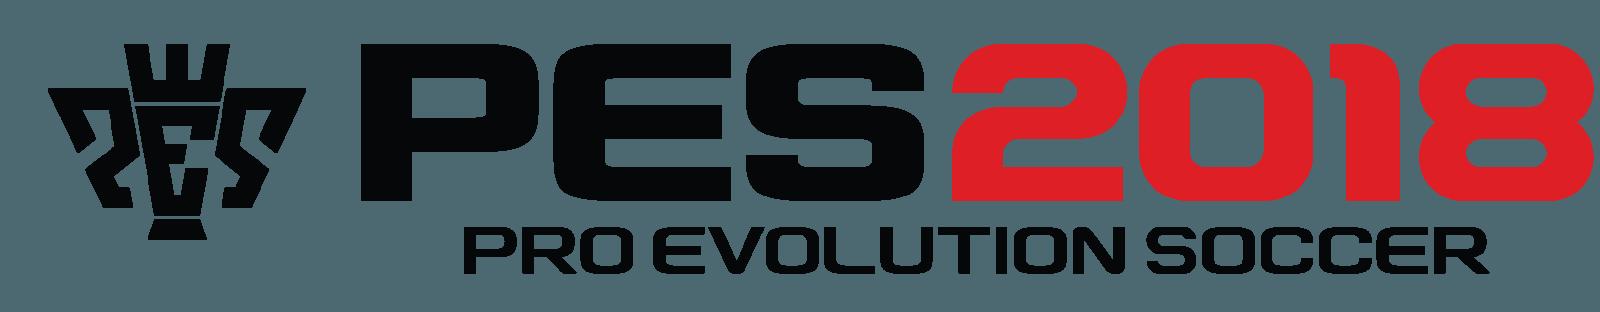 Pro Evolution Soccer 2018 PC Sistem Gereksinimleri